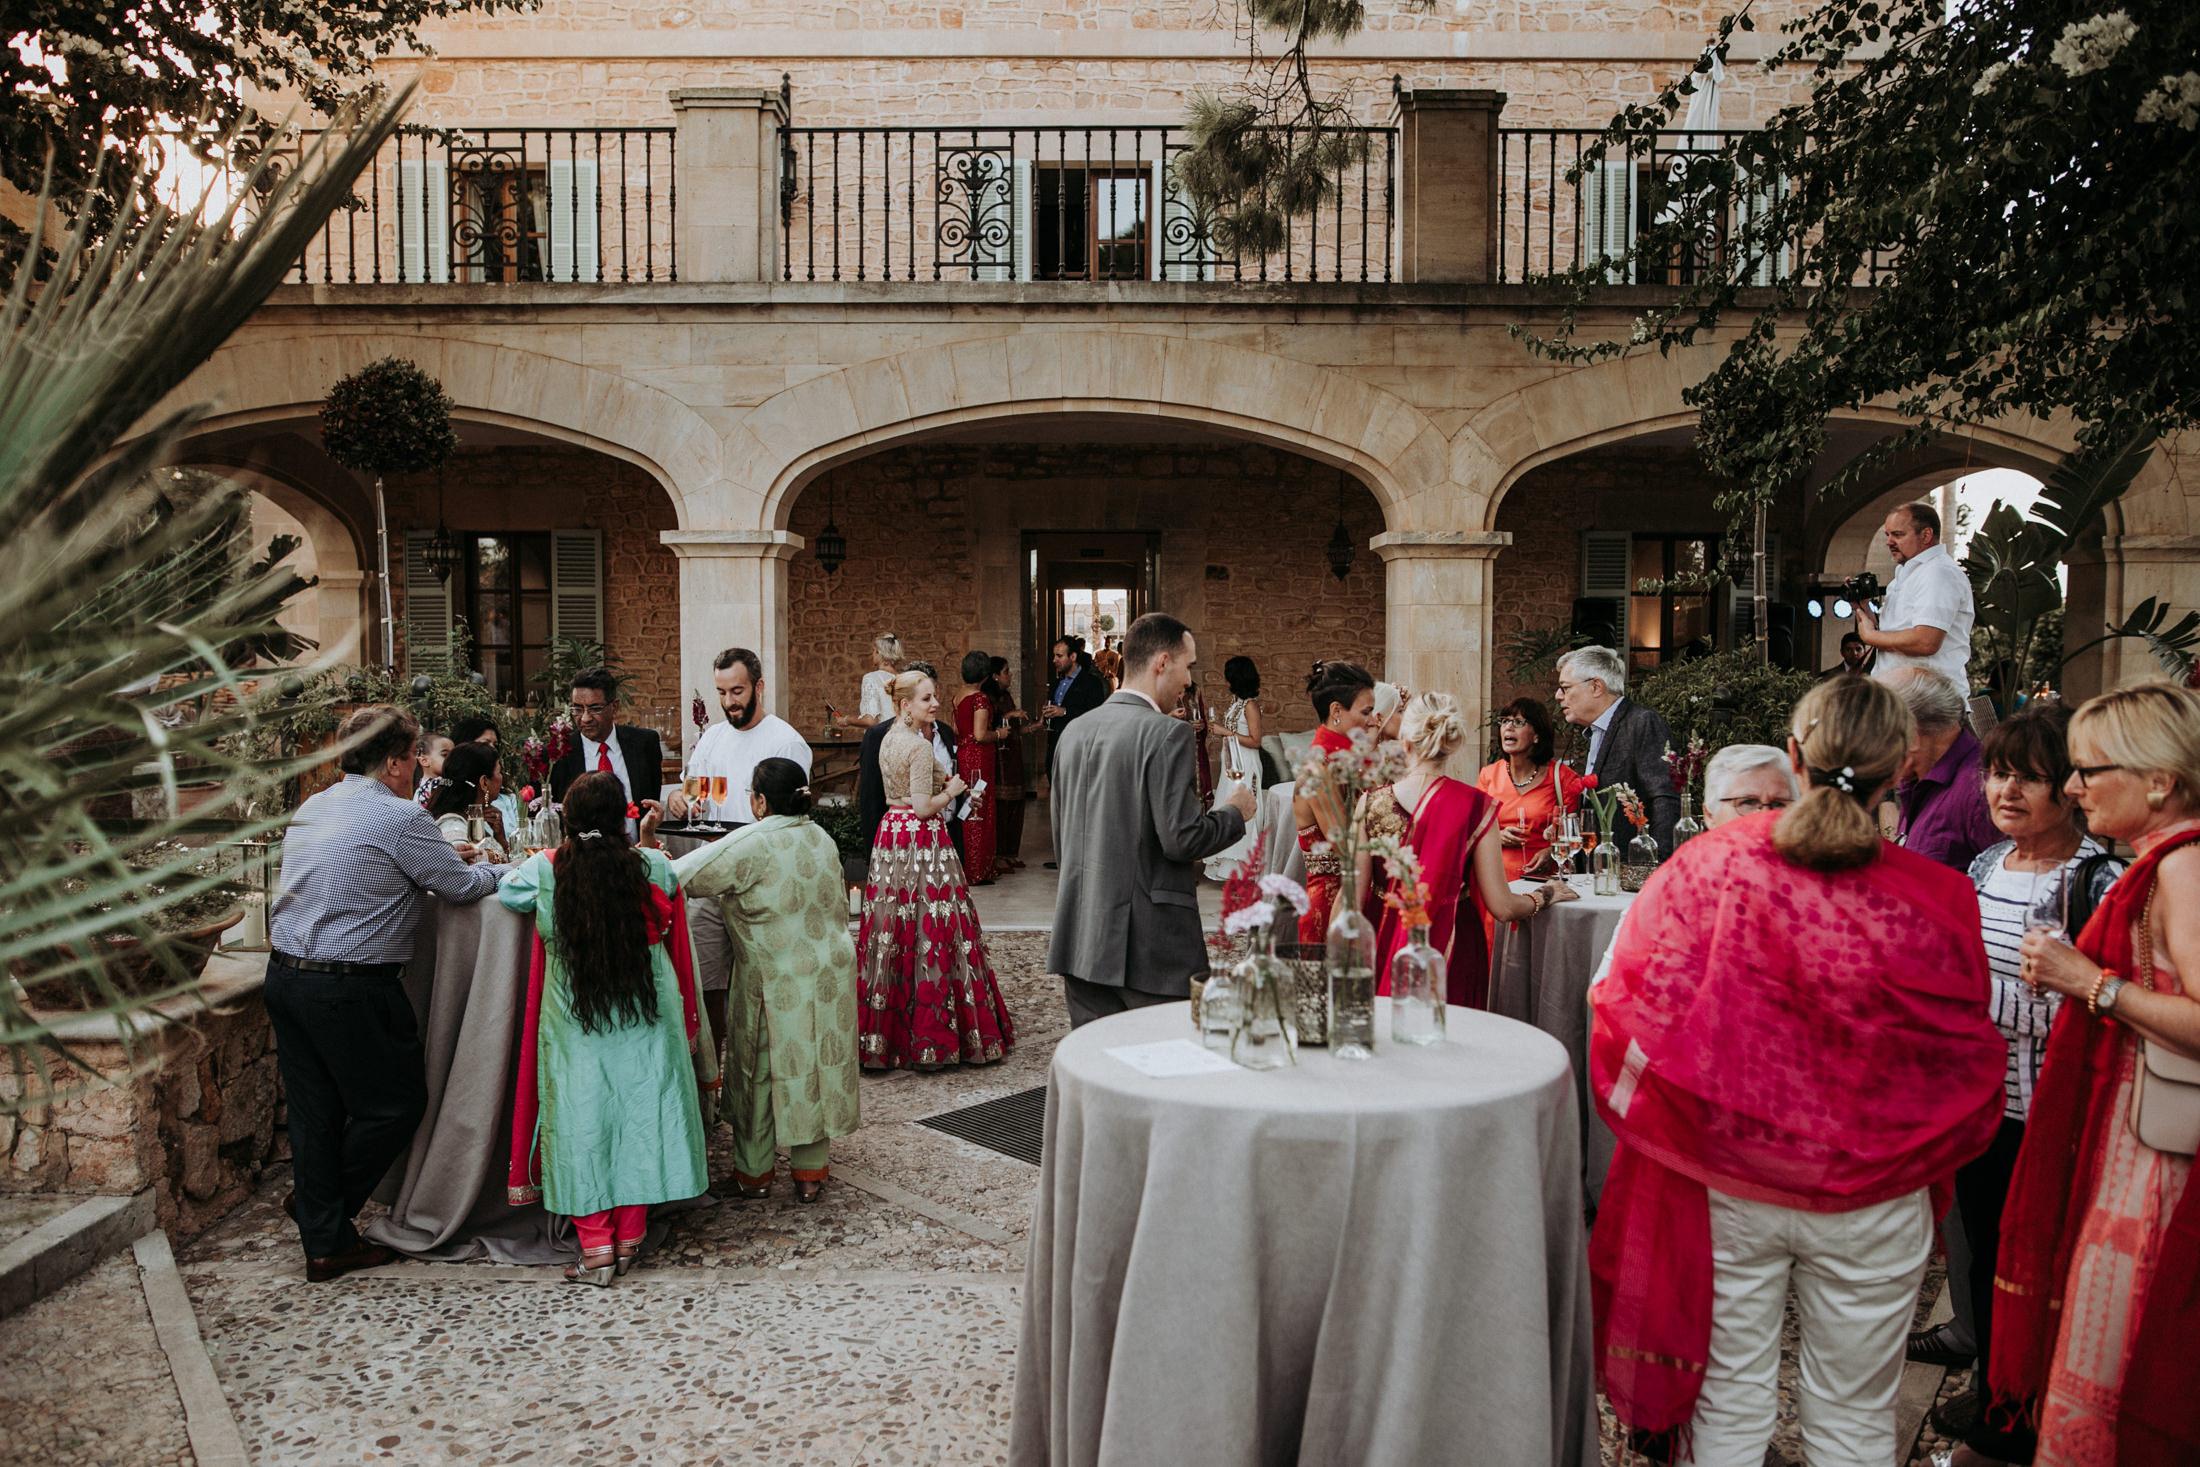 Wedding_Photographer_Mallorca_Daniela-Marquardt_Photography_New_York_Iceland_Tuscany_Santorini_Portugal_Austria_Bavaria_Elopement_Hochzeitsfotograf_AntjeRajat1_45